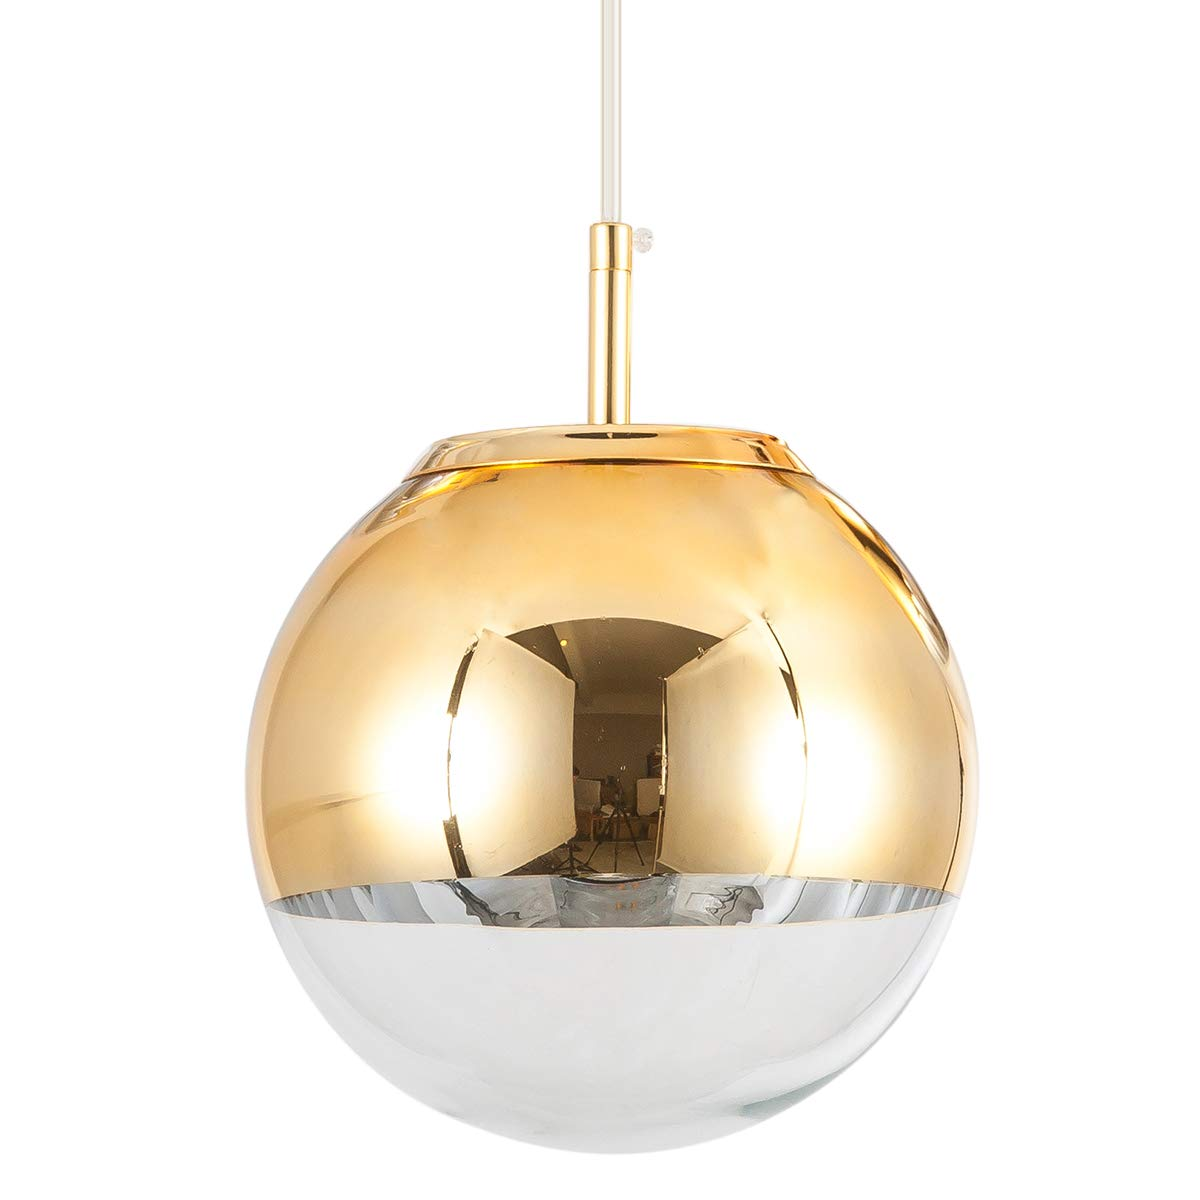 Modern Mini Globe Pendant Lighting with Handblown Clear Glass, Adjustable Mirror Ball Pendant Lamp for Living Room Kitchen Island Hallways Restaurants Bar Cafe, Polished Golden Finish, 10 inches